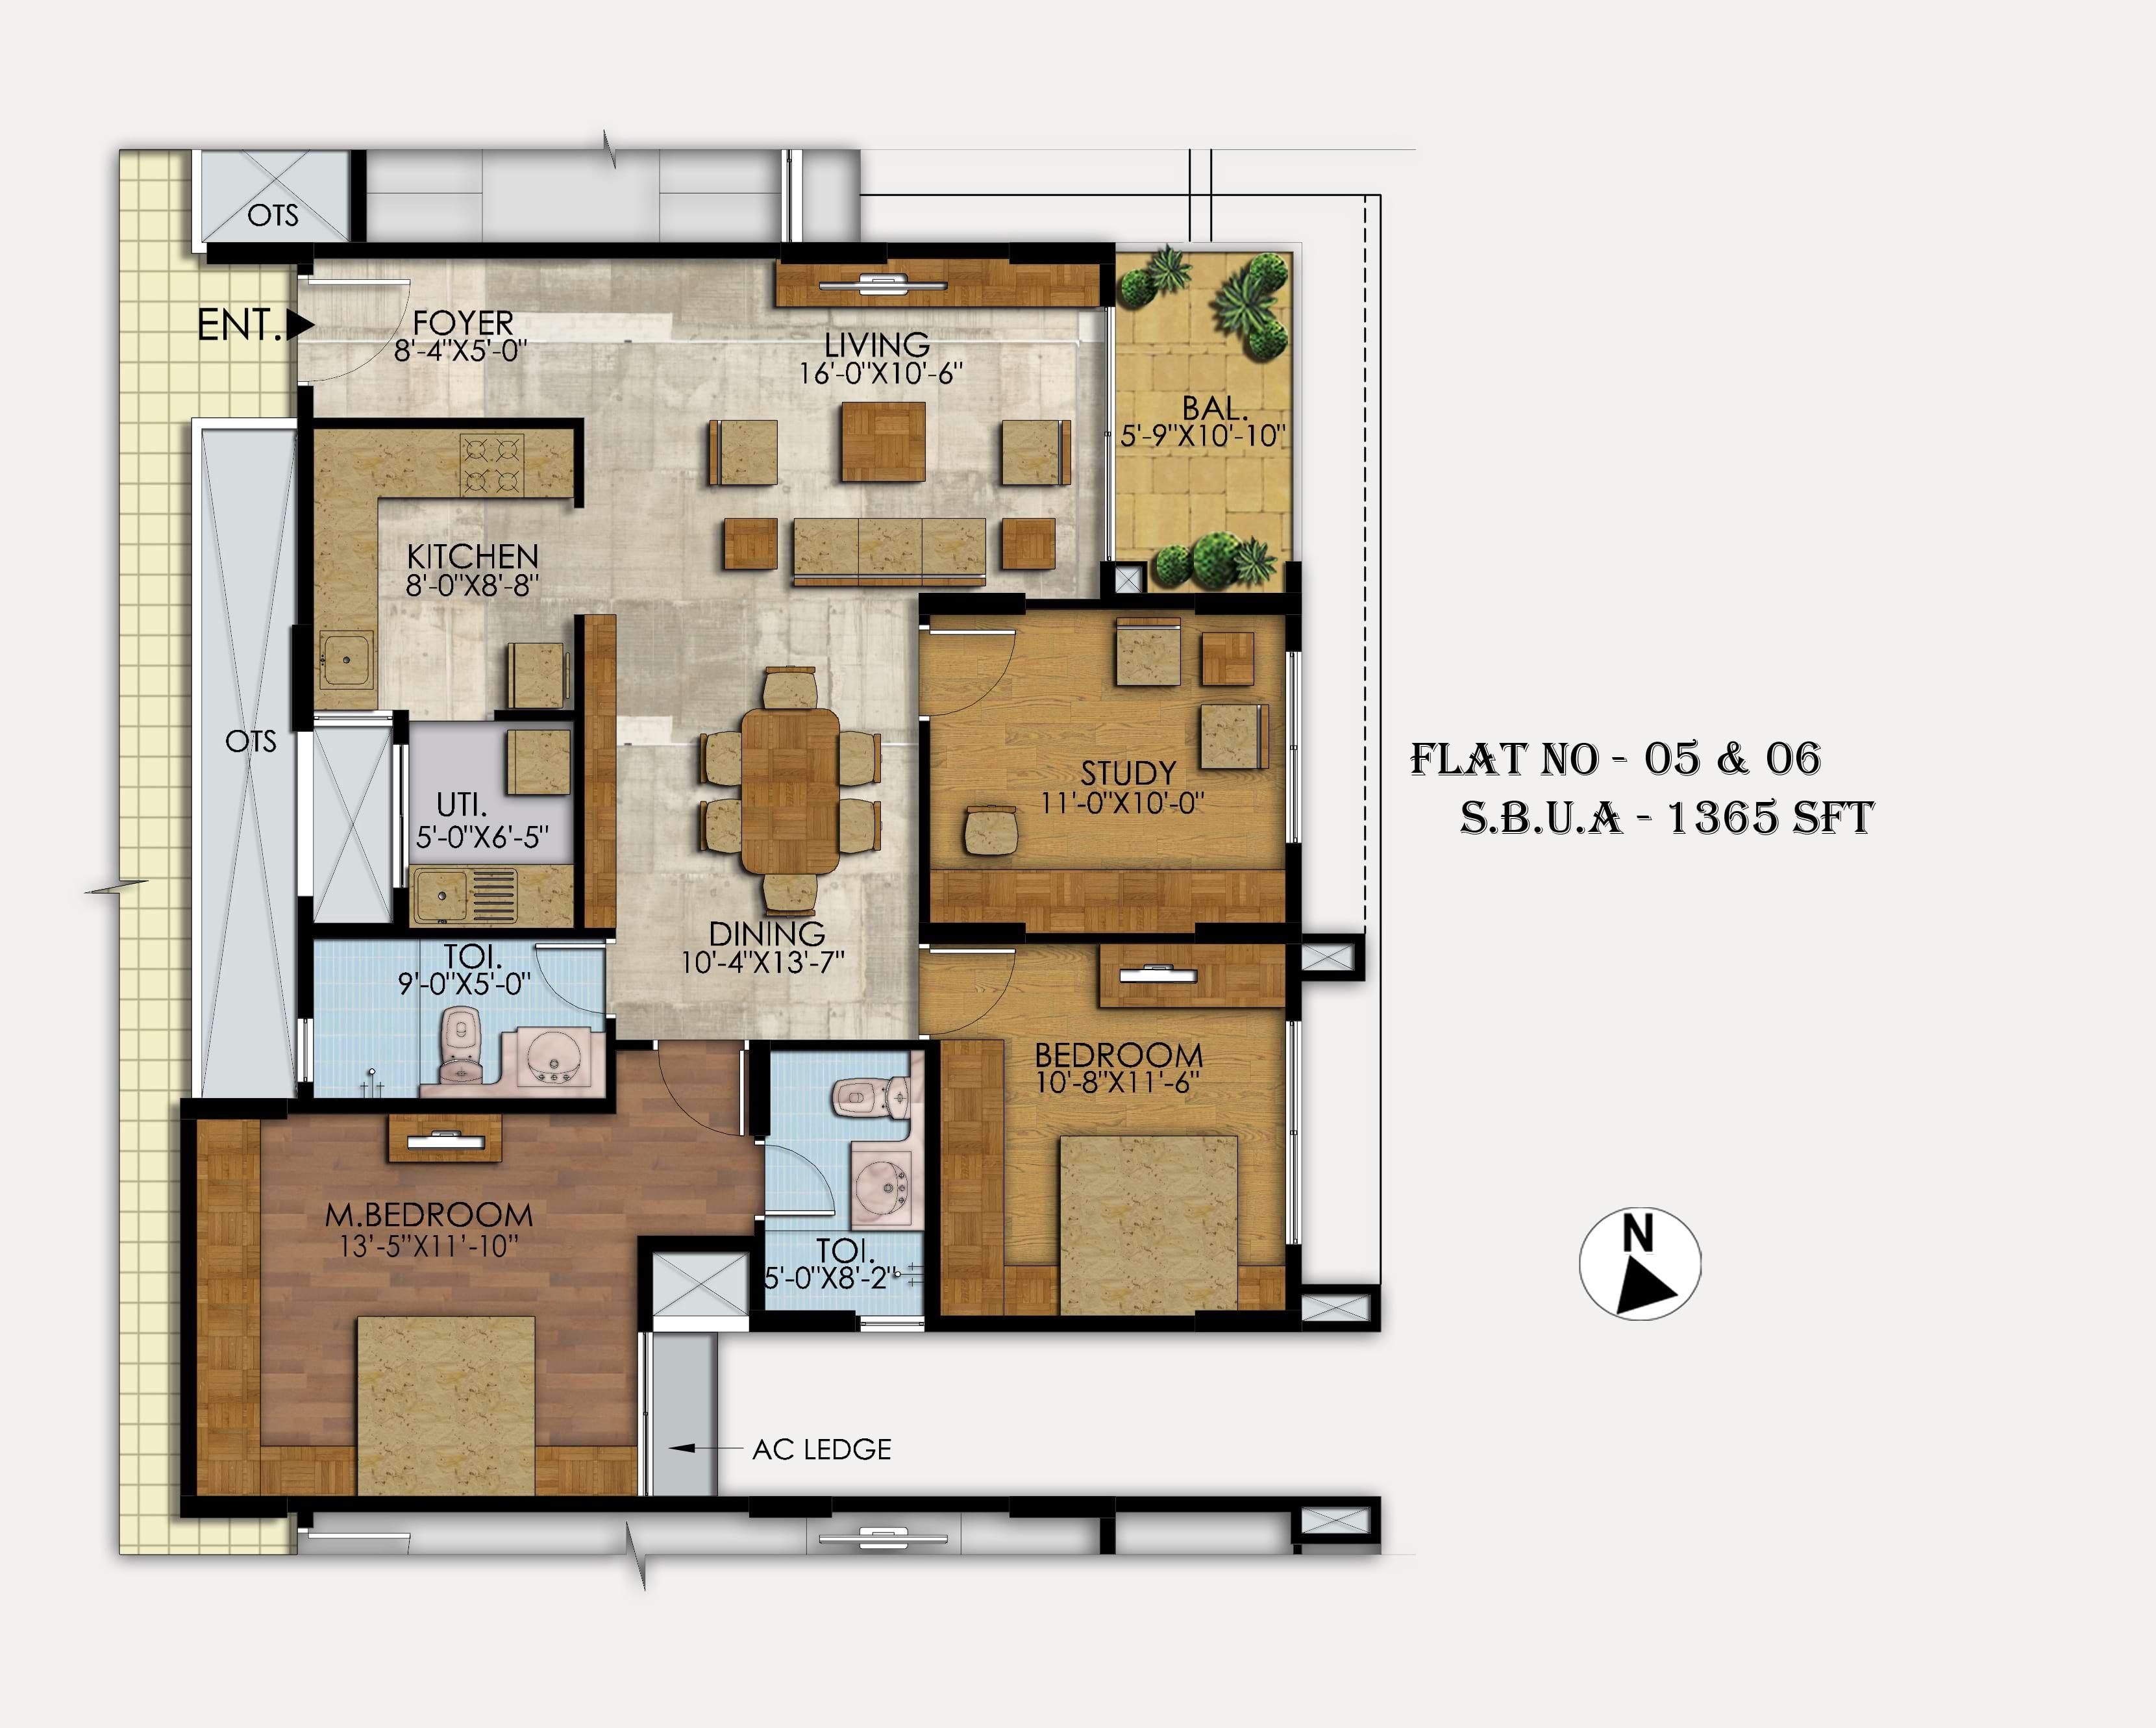 Mahaveer-Ranches-3BHK-1365-sqft-floorplan